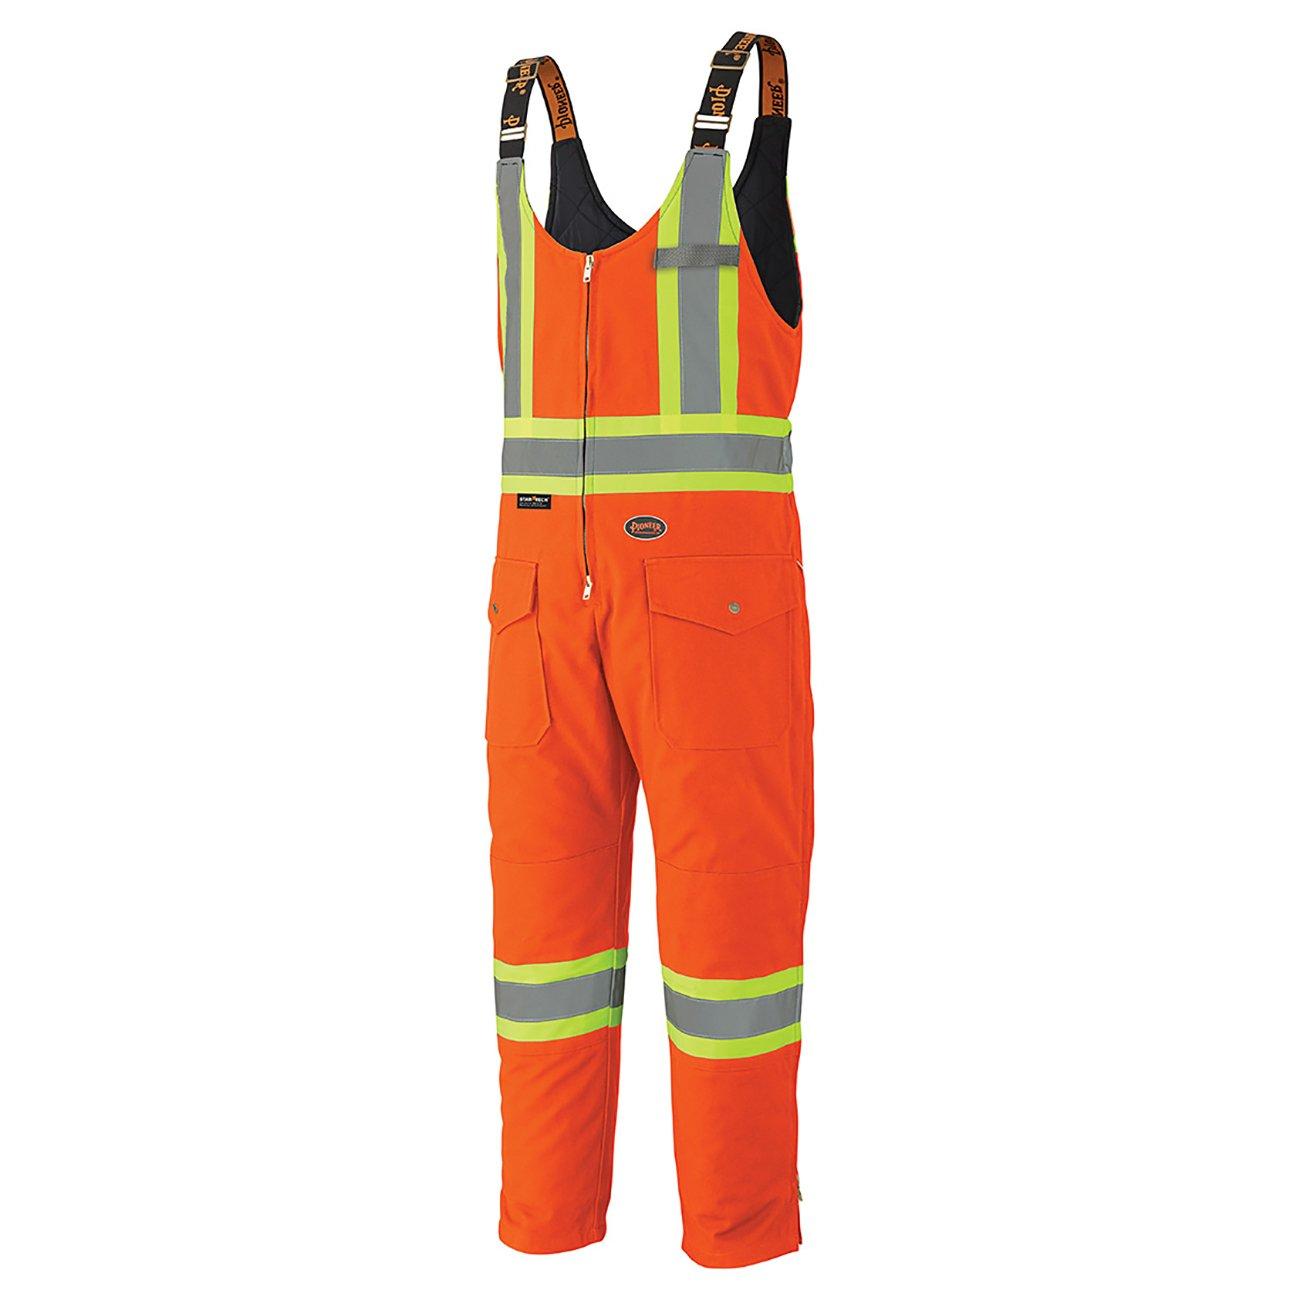 Pioneer V2060550-L Insulated Heavy-Duty Work Overall, 4 Pockets, Men Hi-Vis Bib Pants, Orange, L